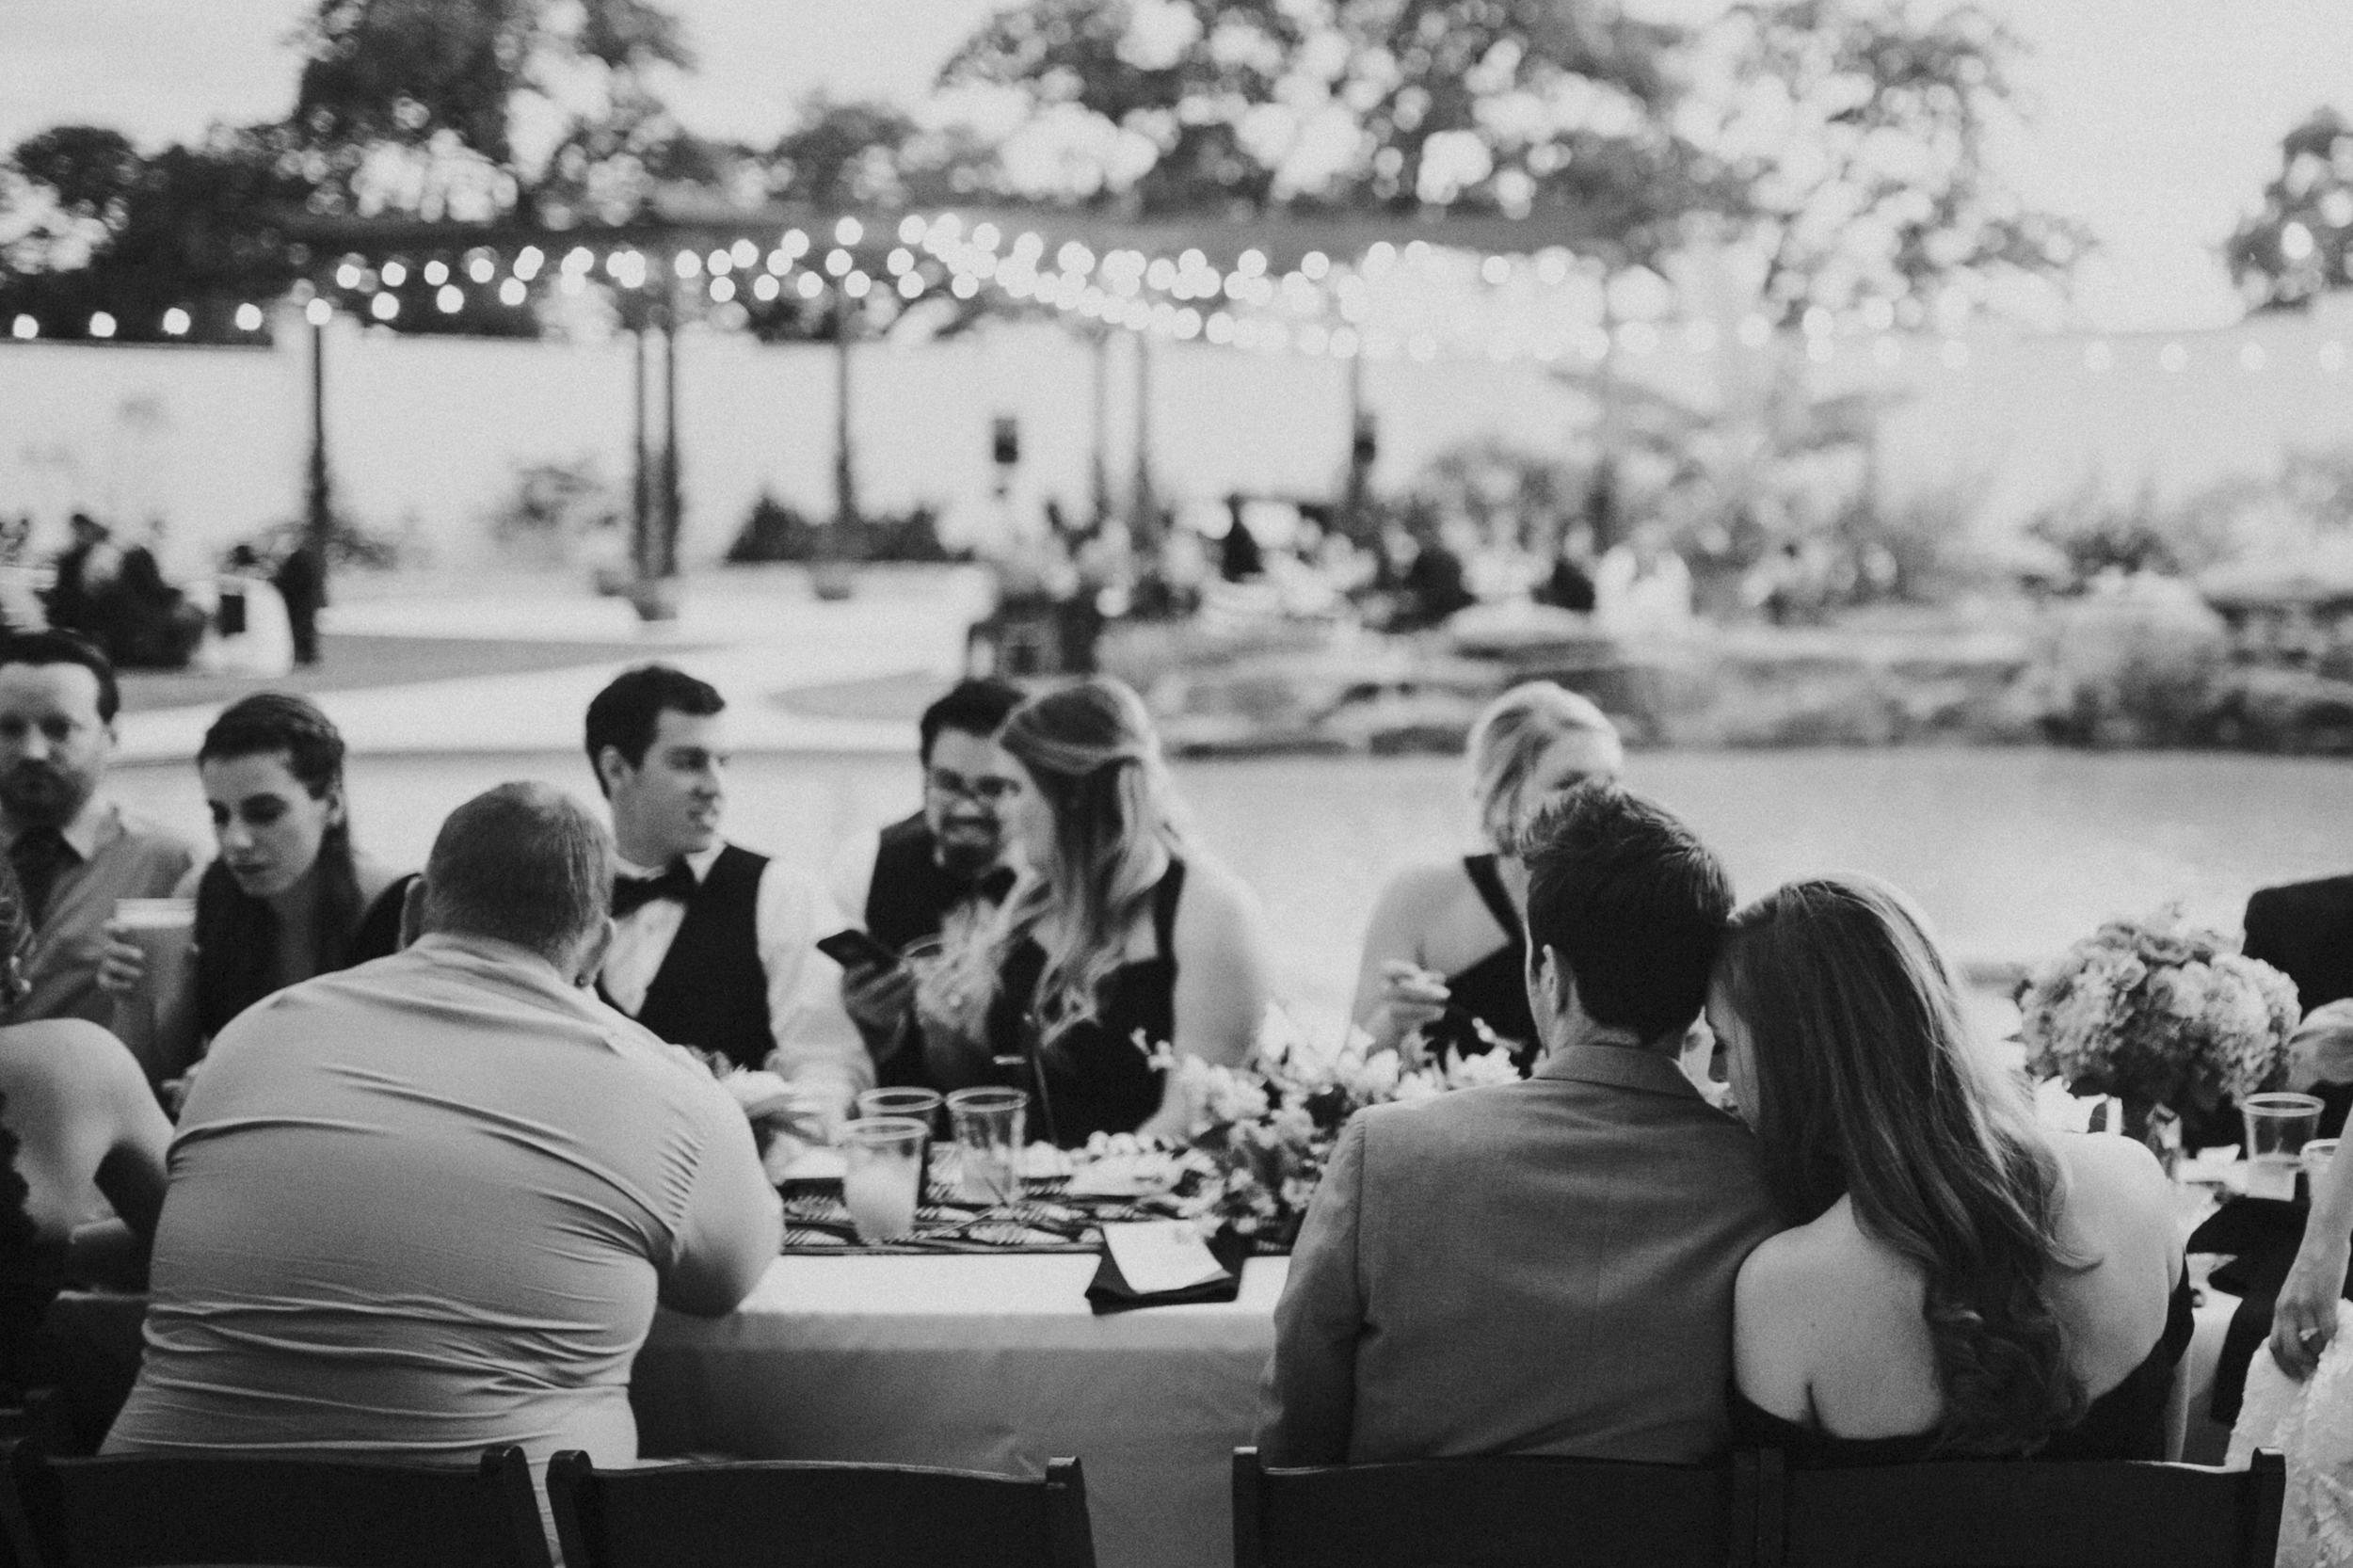 Garden Grove Wedding & Event Center5747.JPG